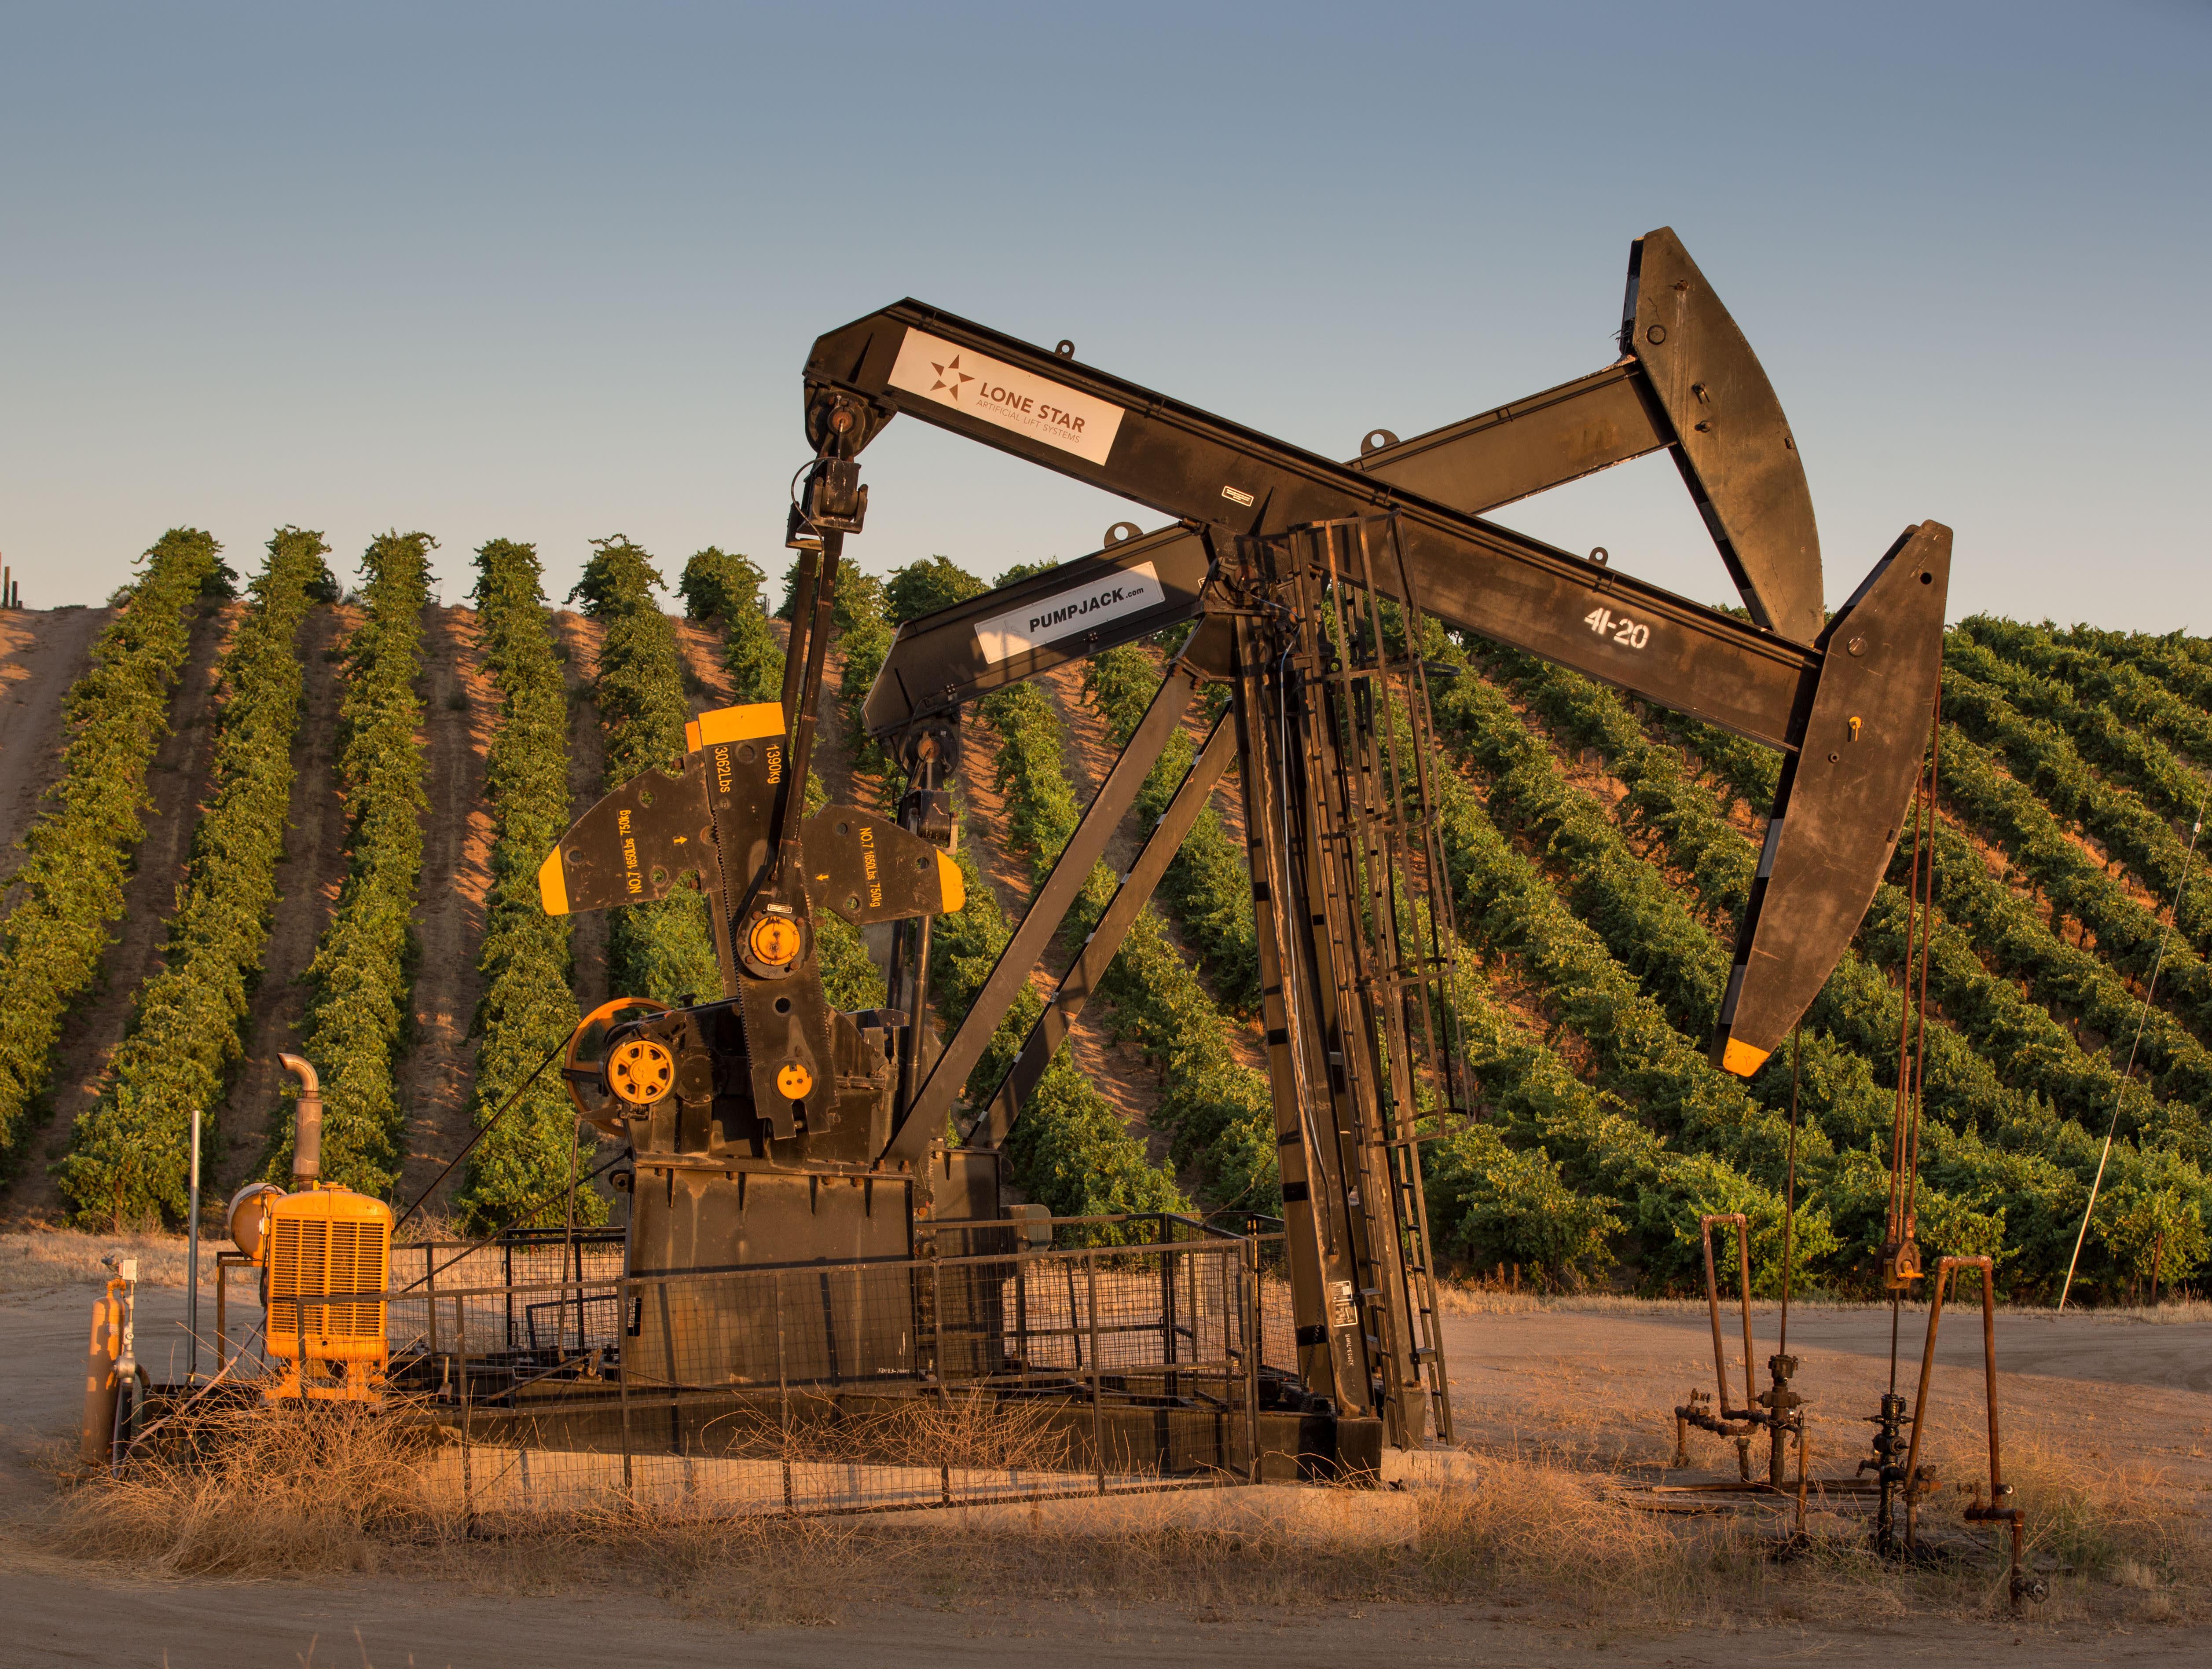 European markets set to open sharply lower as investors digest OPEC deal